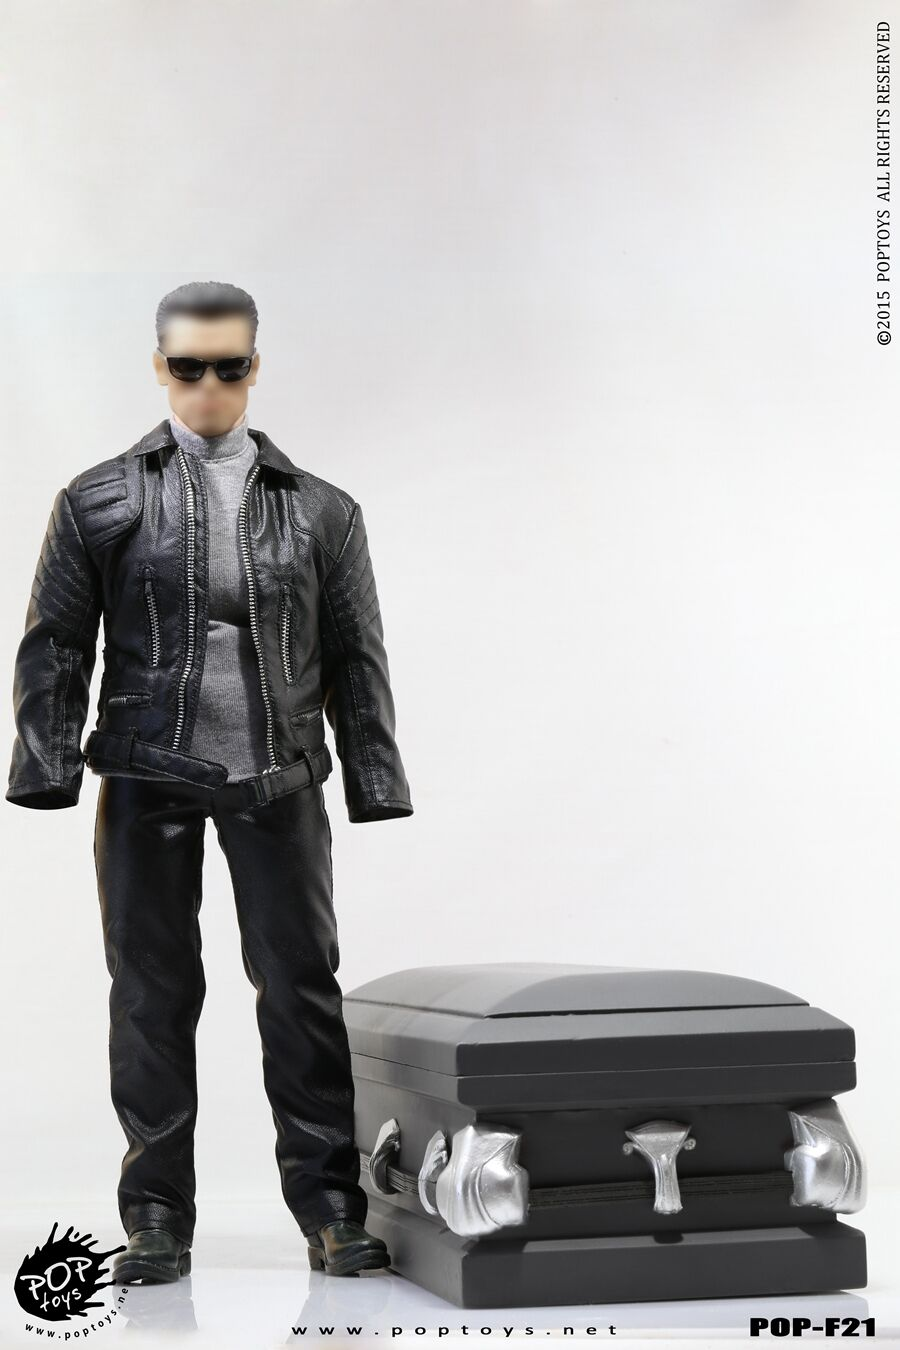 Pop Juguetes F21 Robot con / Madera Coffin - T800 Cuero Abrigo Compatible 1/6